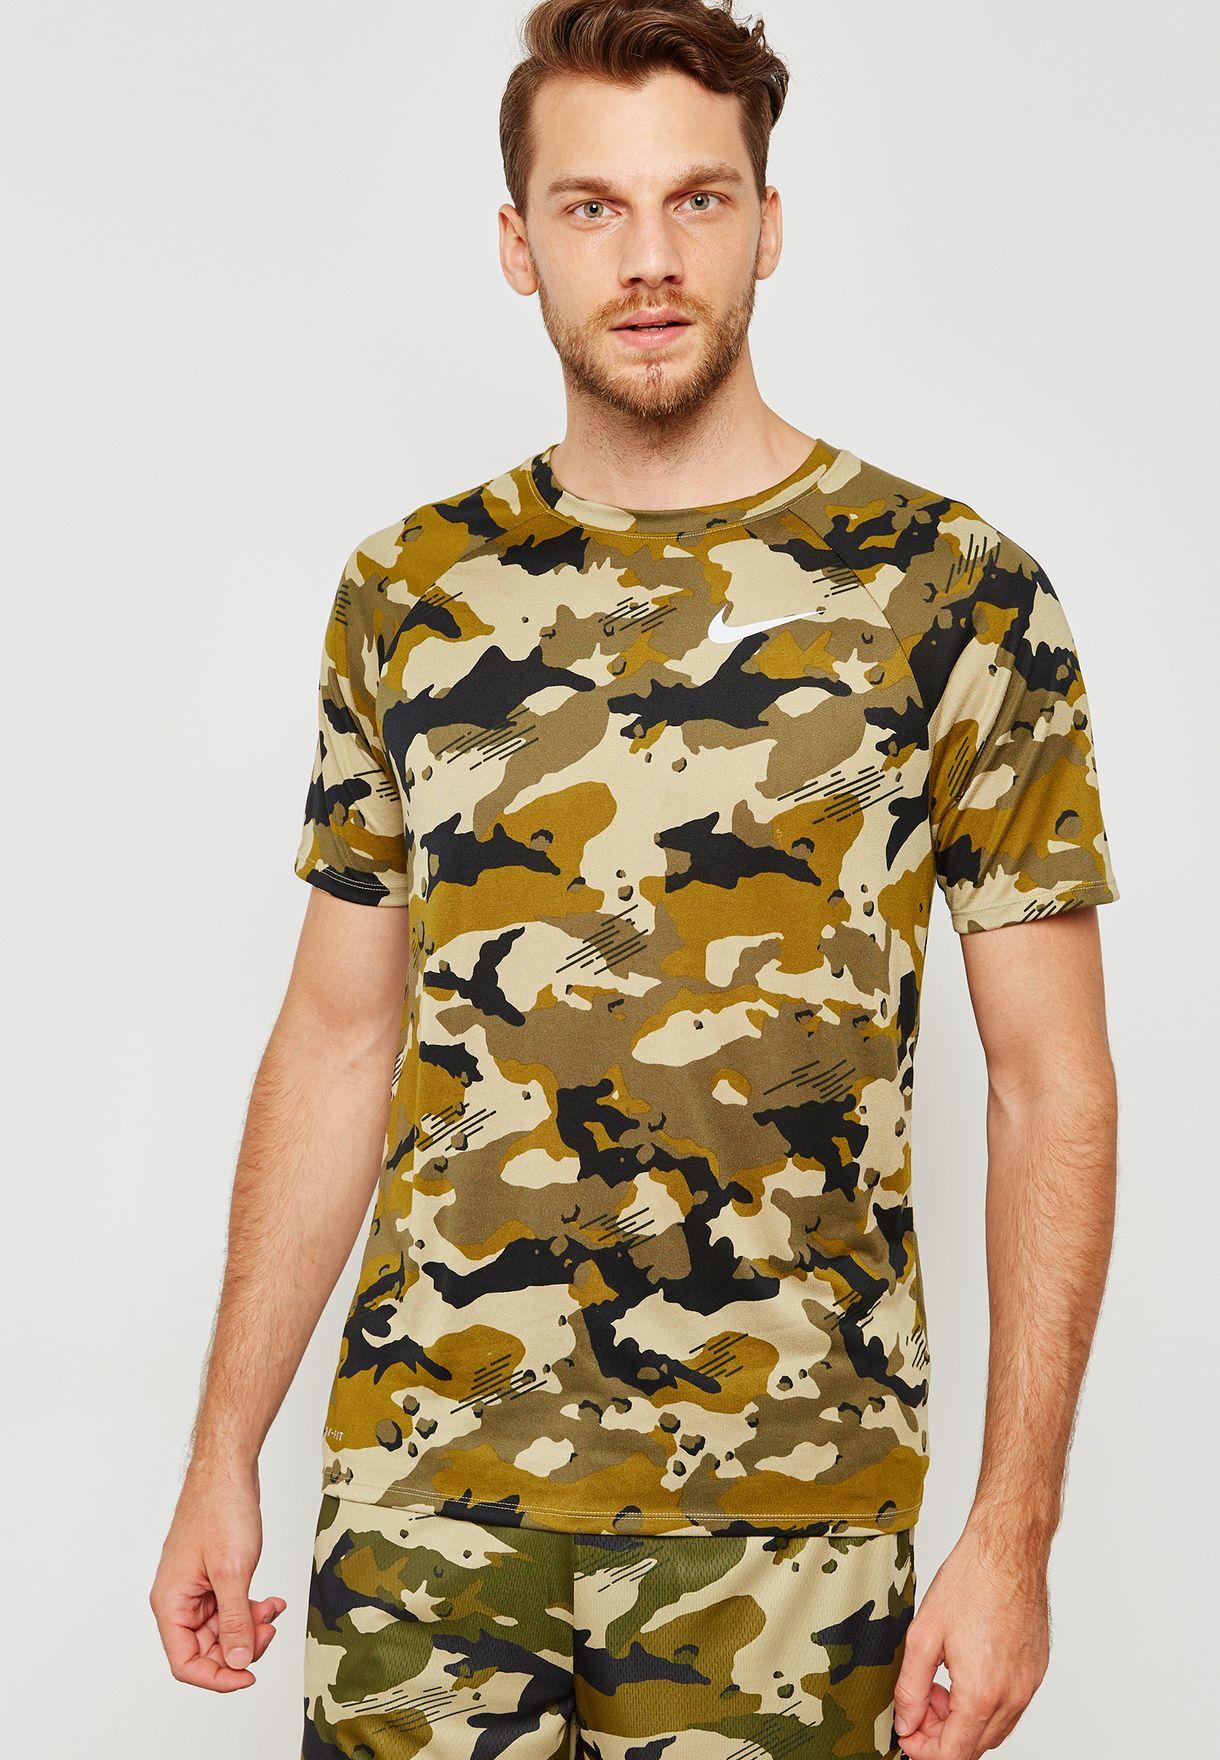 d7a5a502f3b4 Shop Nike prints Dri-FIT Camo T-Shirt 923524-209 for Men in UAE ...